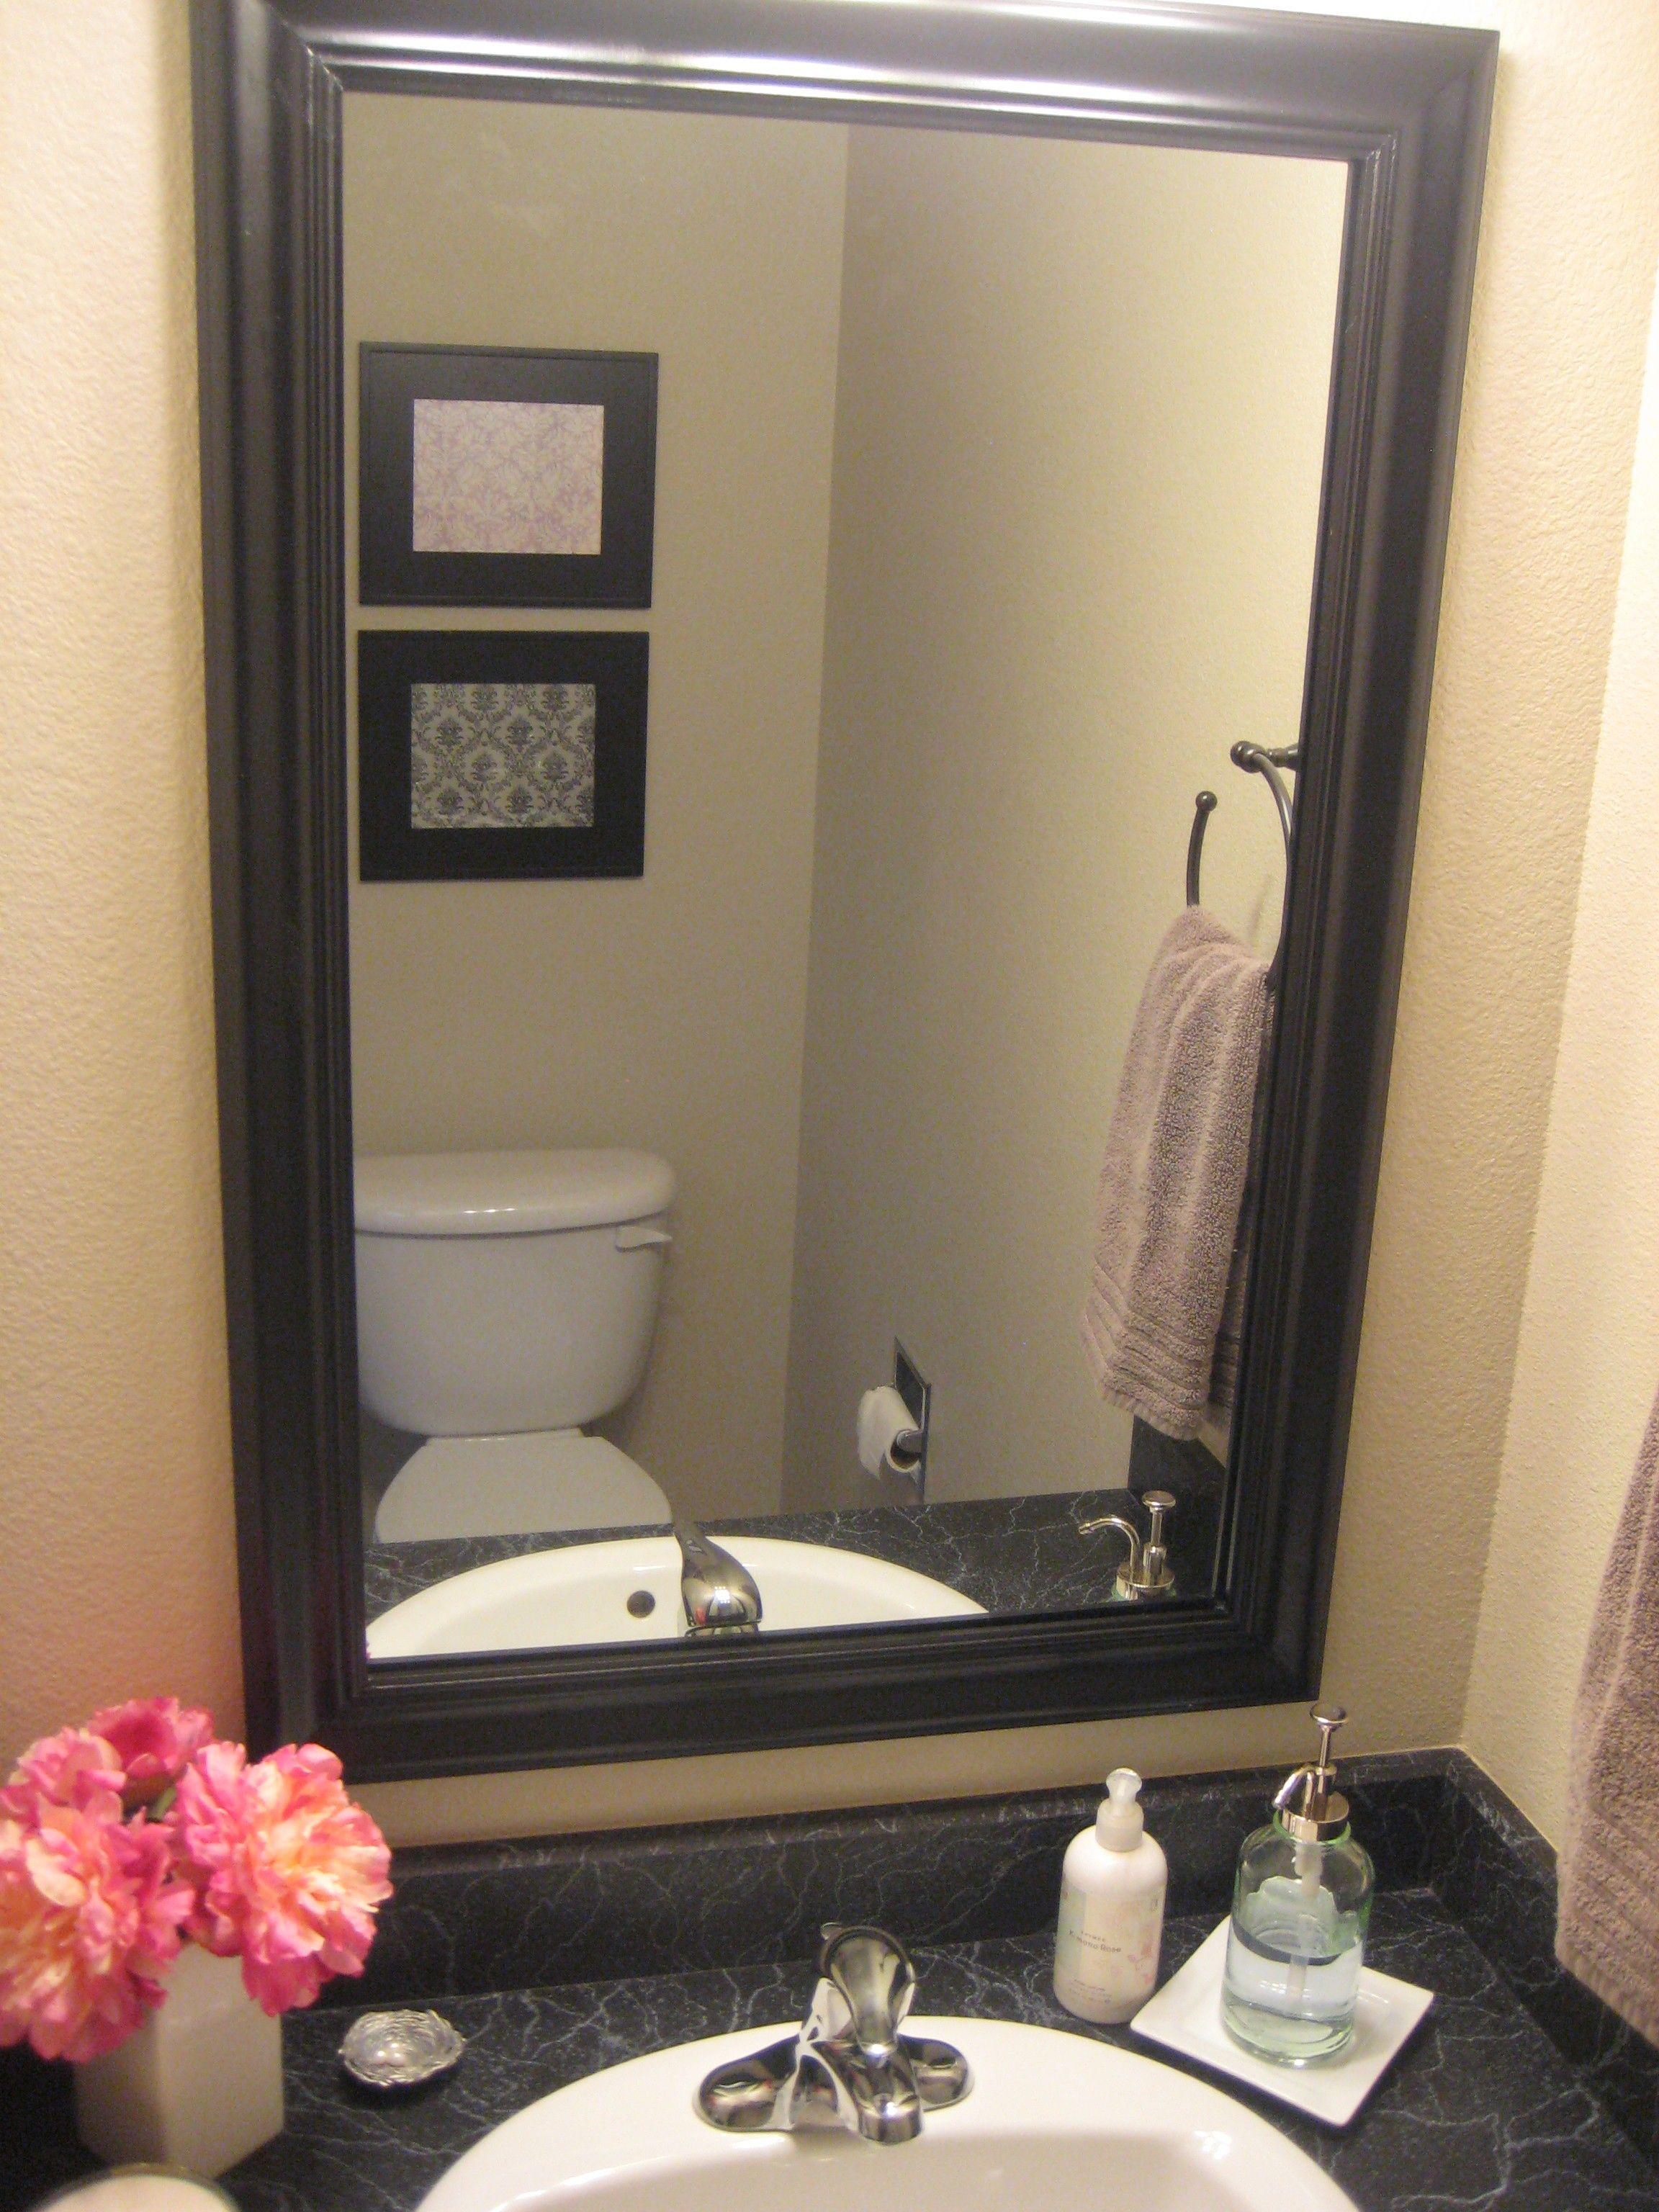 Bathroom Interior Height Bathroom Wall Mirror With Black Wooden ...